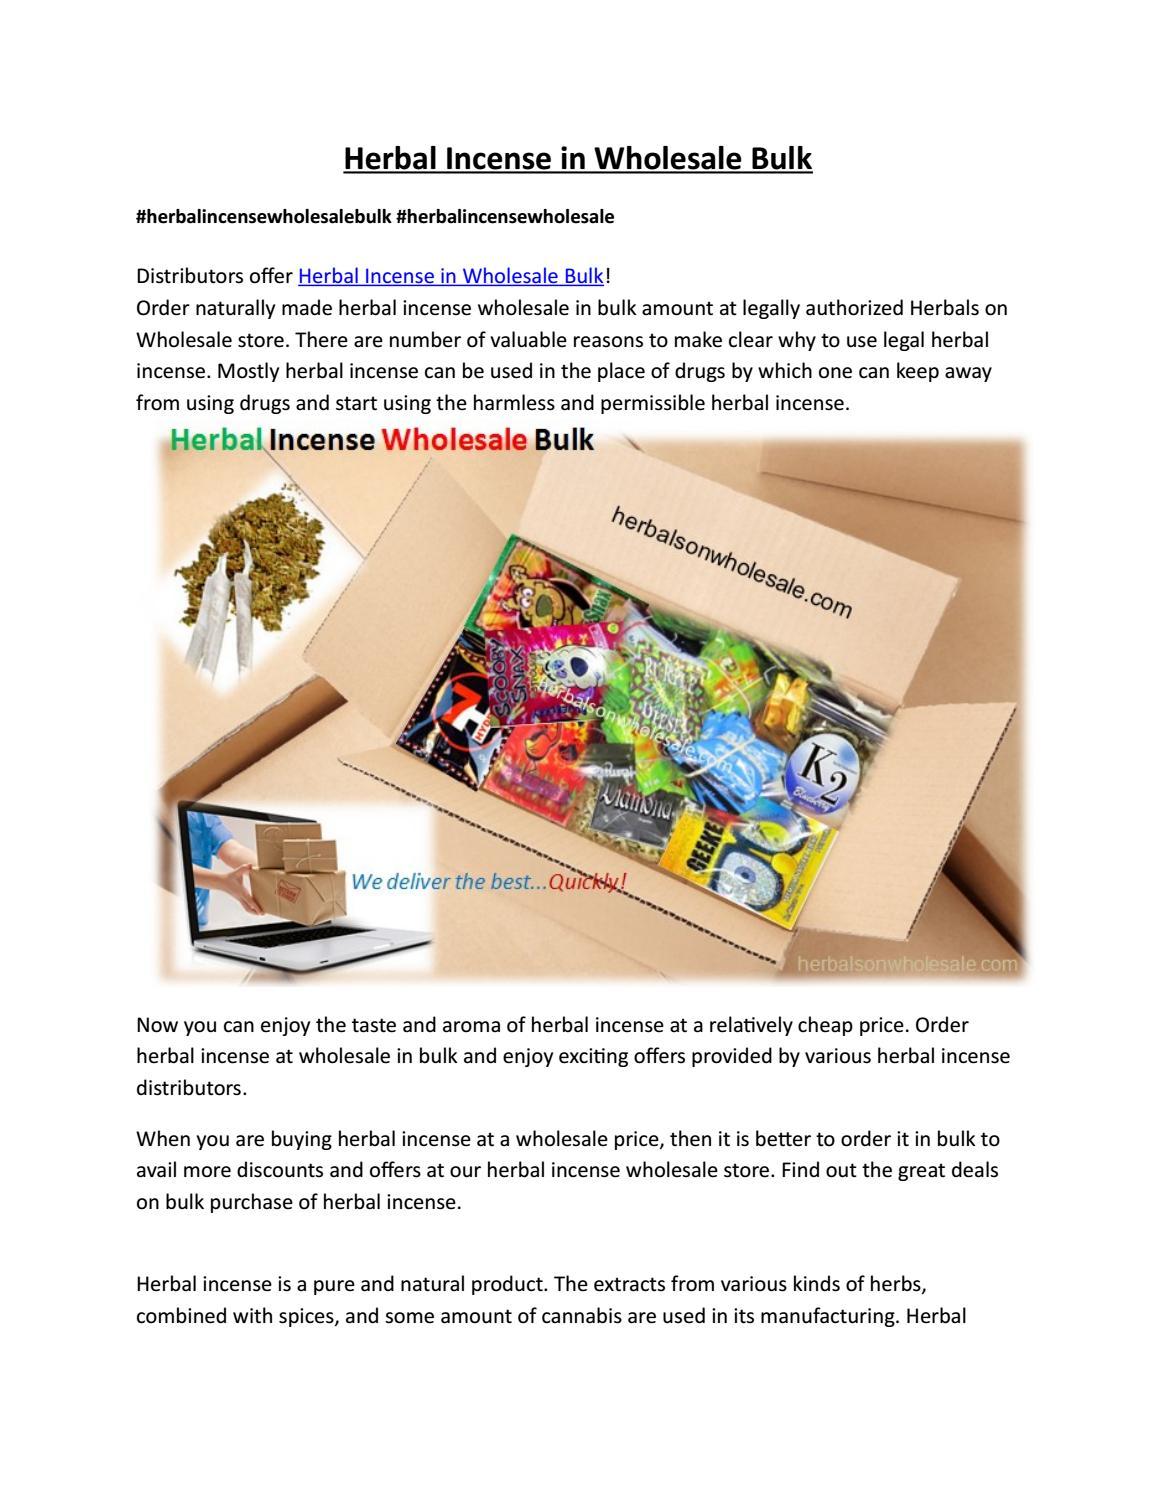 Bulk herbs wholesale - Bulk Herbs Wholesale 53